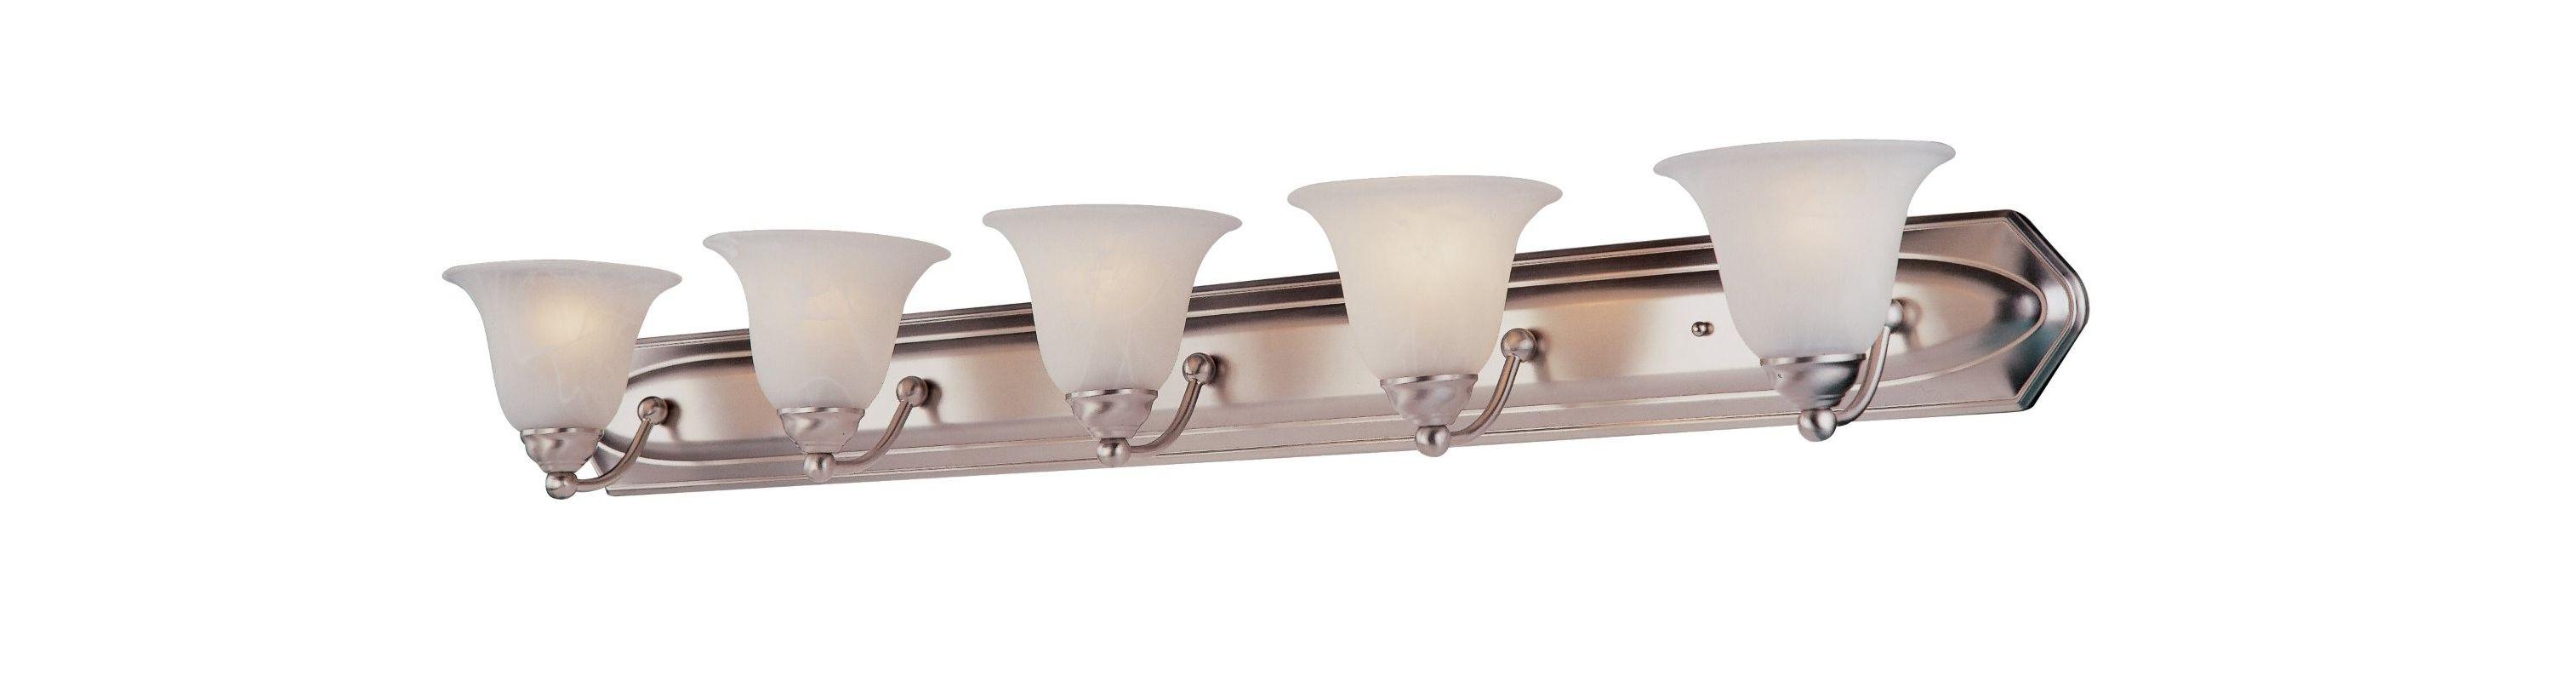 DVI Lighting DVP42405 Diamond 5 Light Incandescent Bathroom Vanity